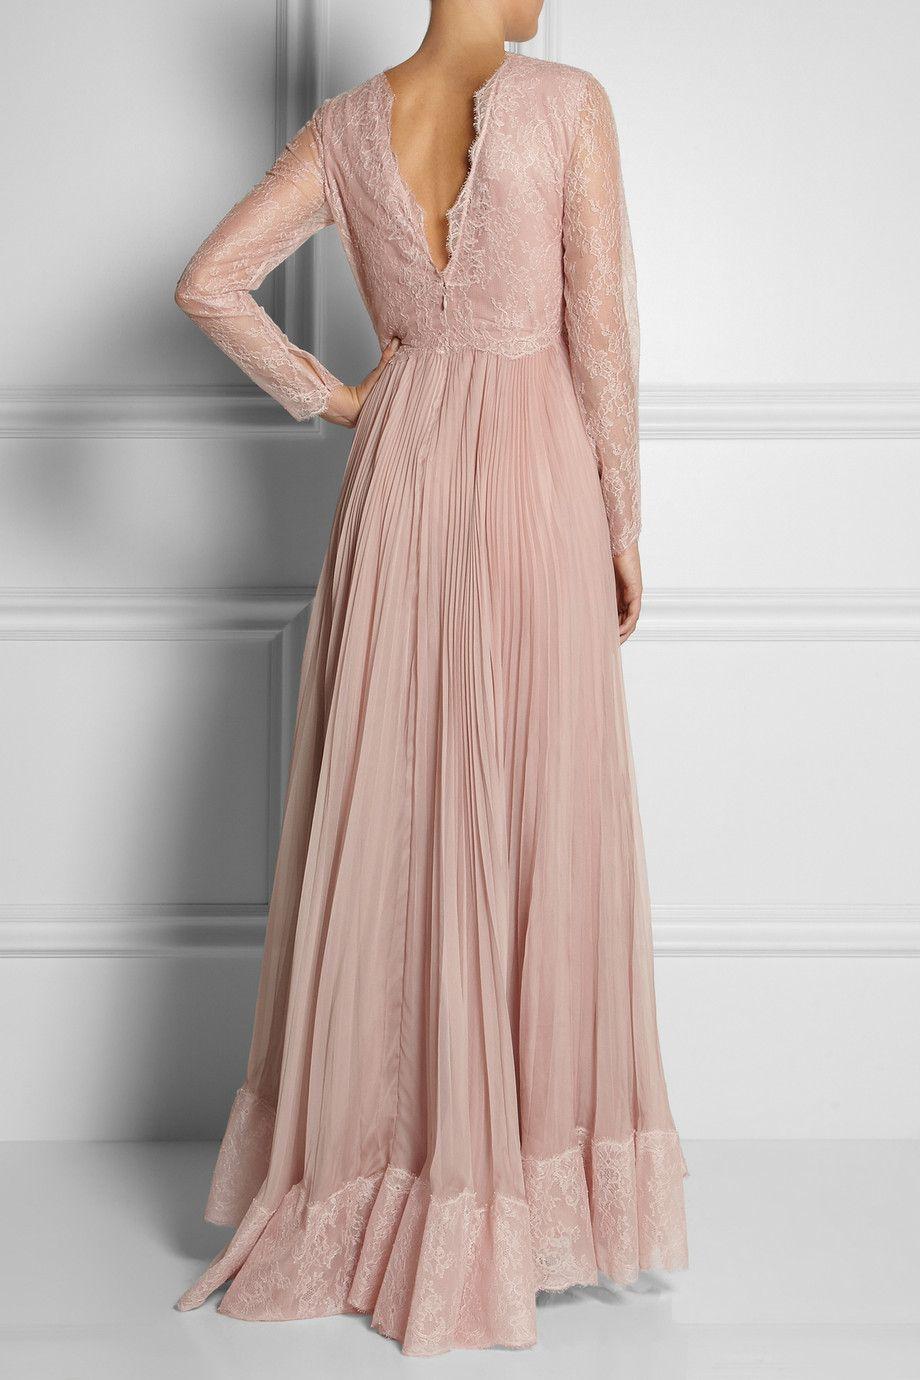 Valentino | Lace and silk gown | NET-A-PORTER.COM | Vestier ...